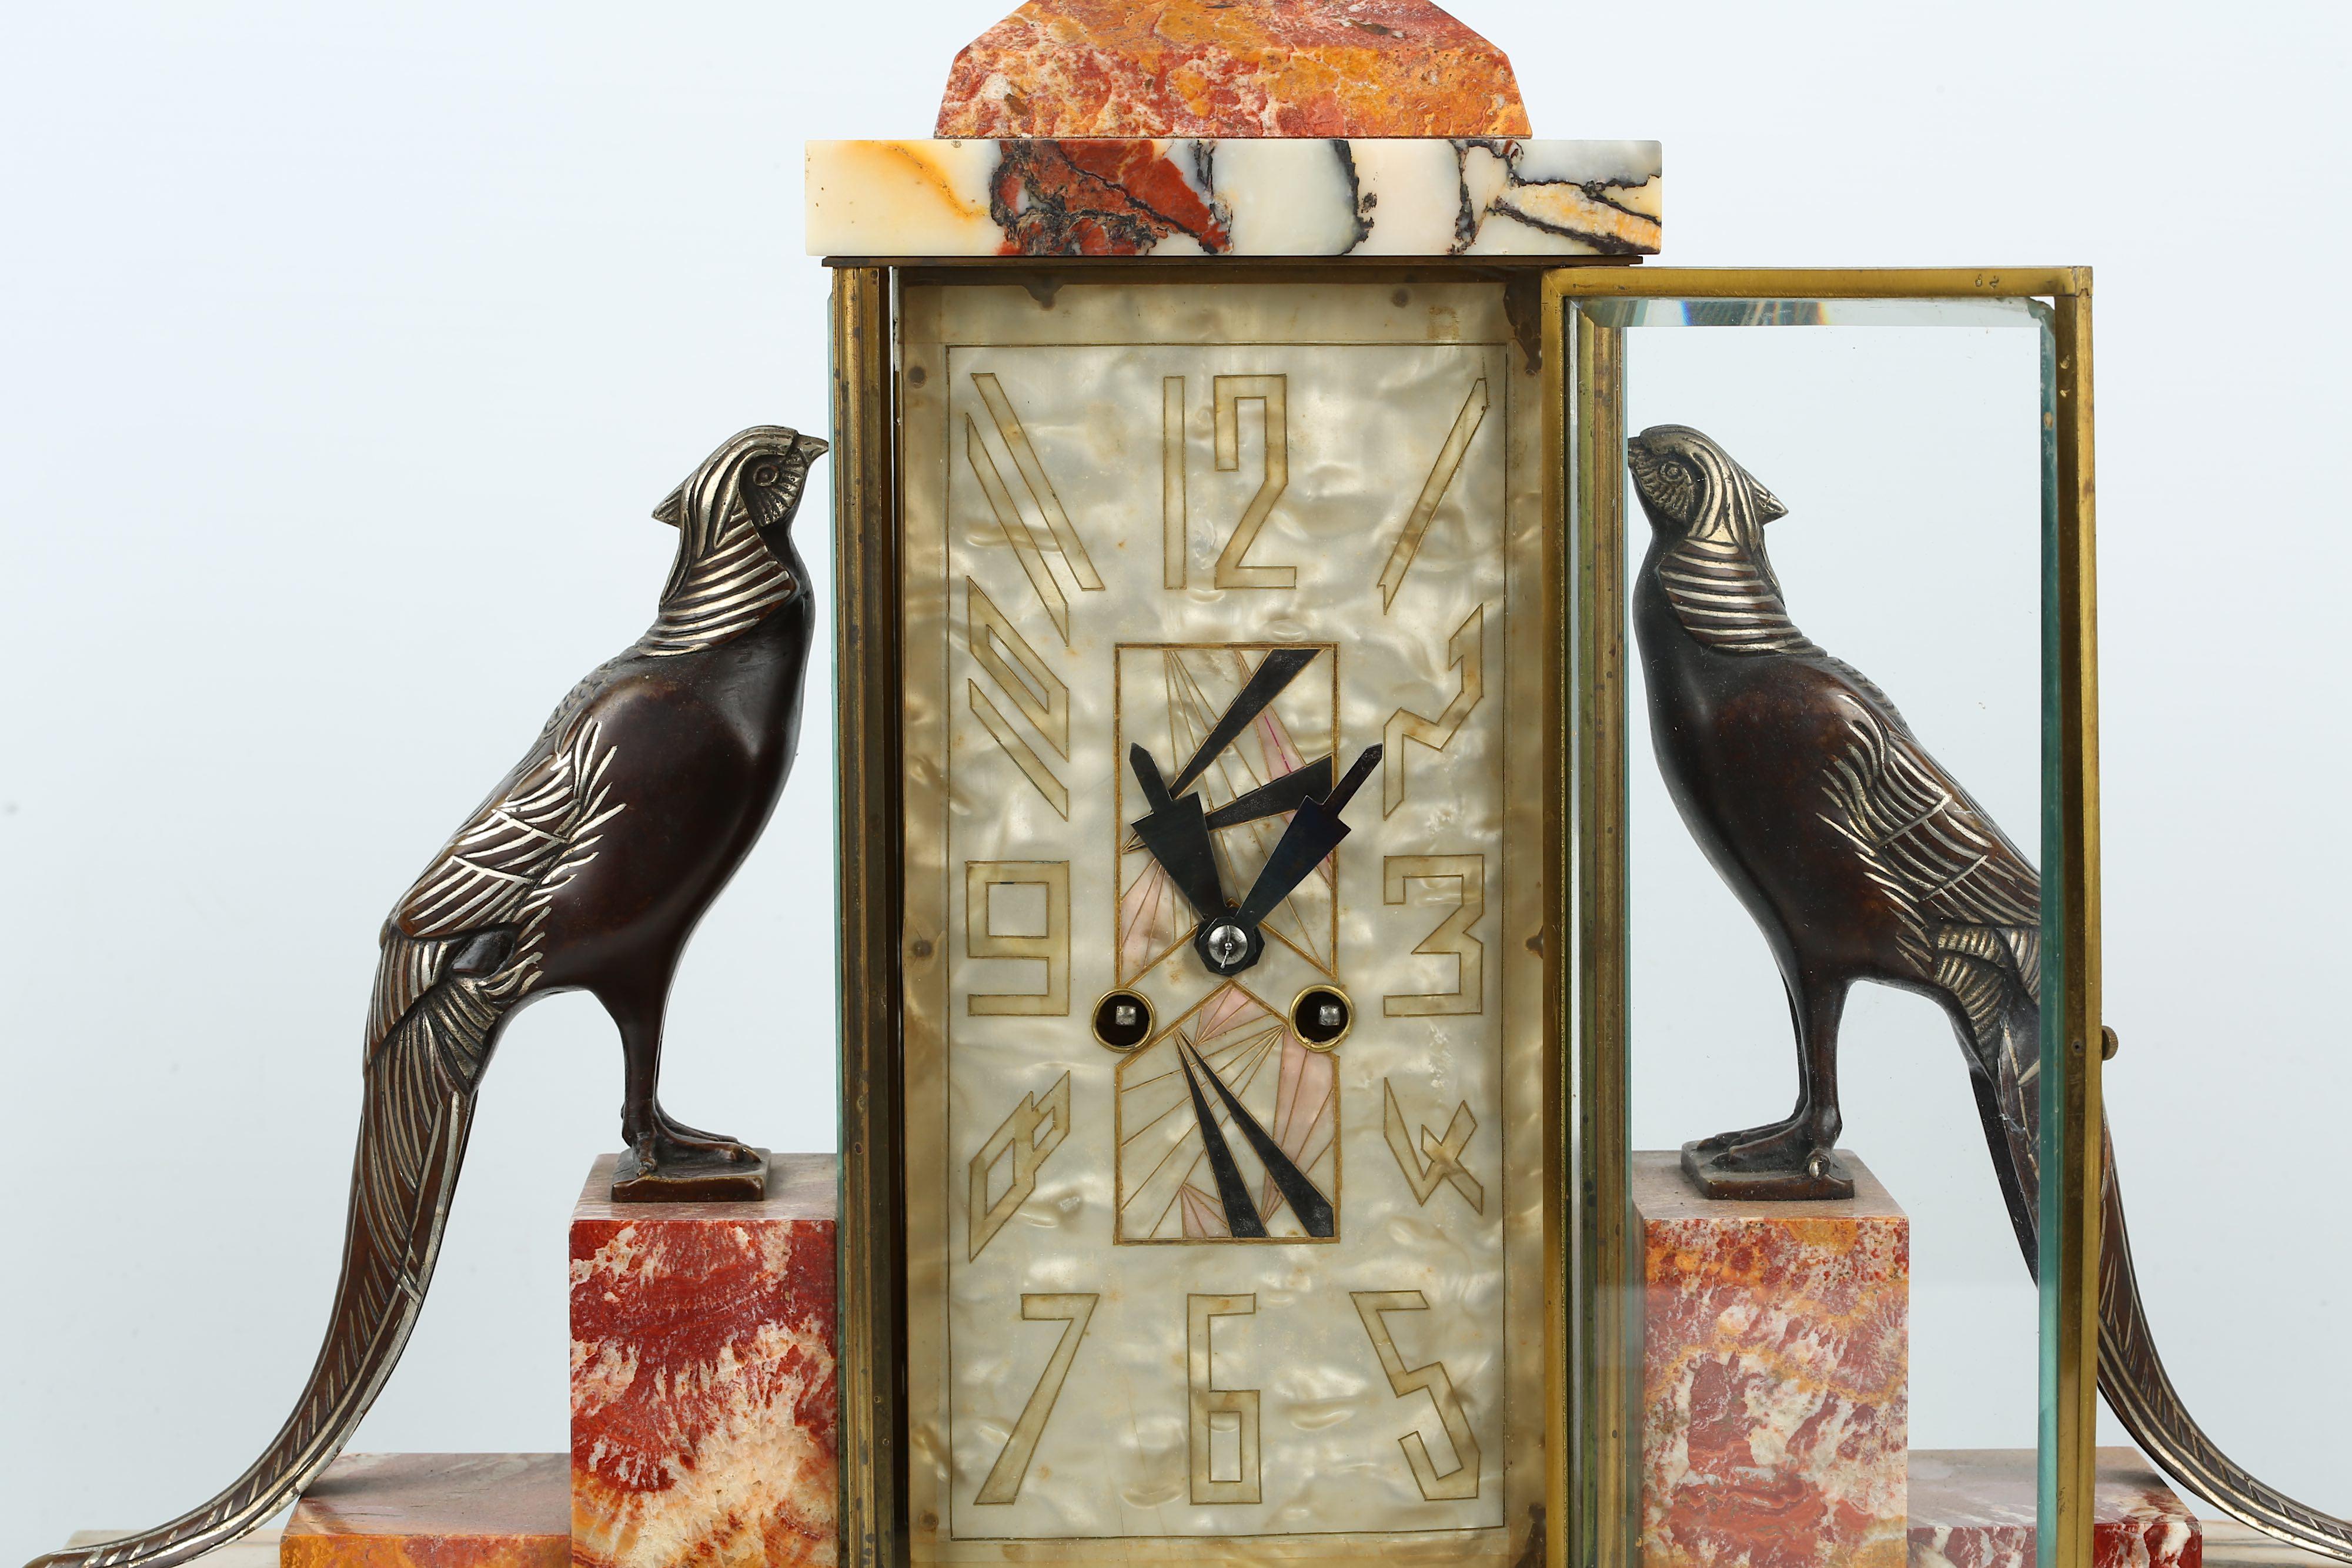 Lot 206 - IRENEÉ ROCHARD (FRENCH, 1906-1984): AN ART DECO PERIOD MARBLE, BRONZE AND SILVERED MANTEL CLOCK GARN